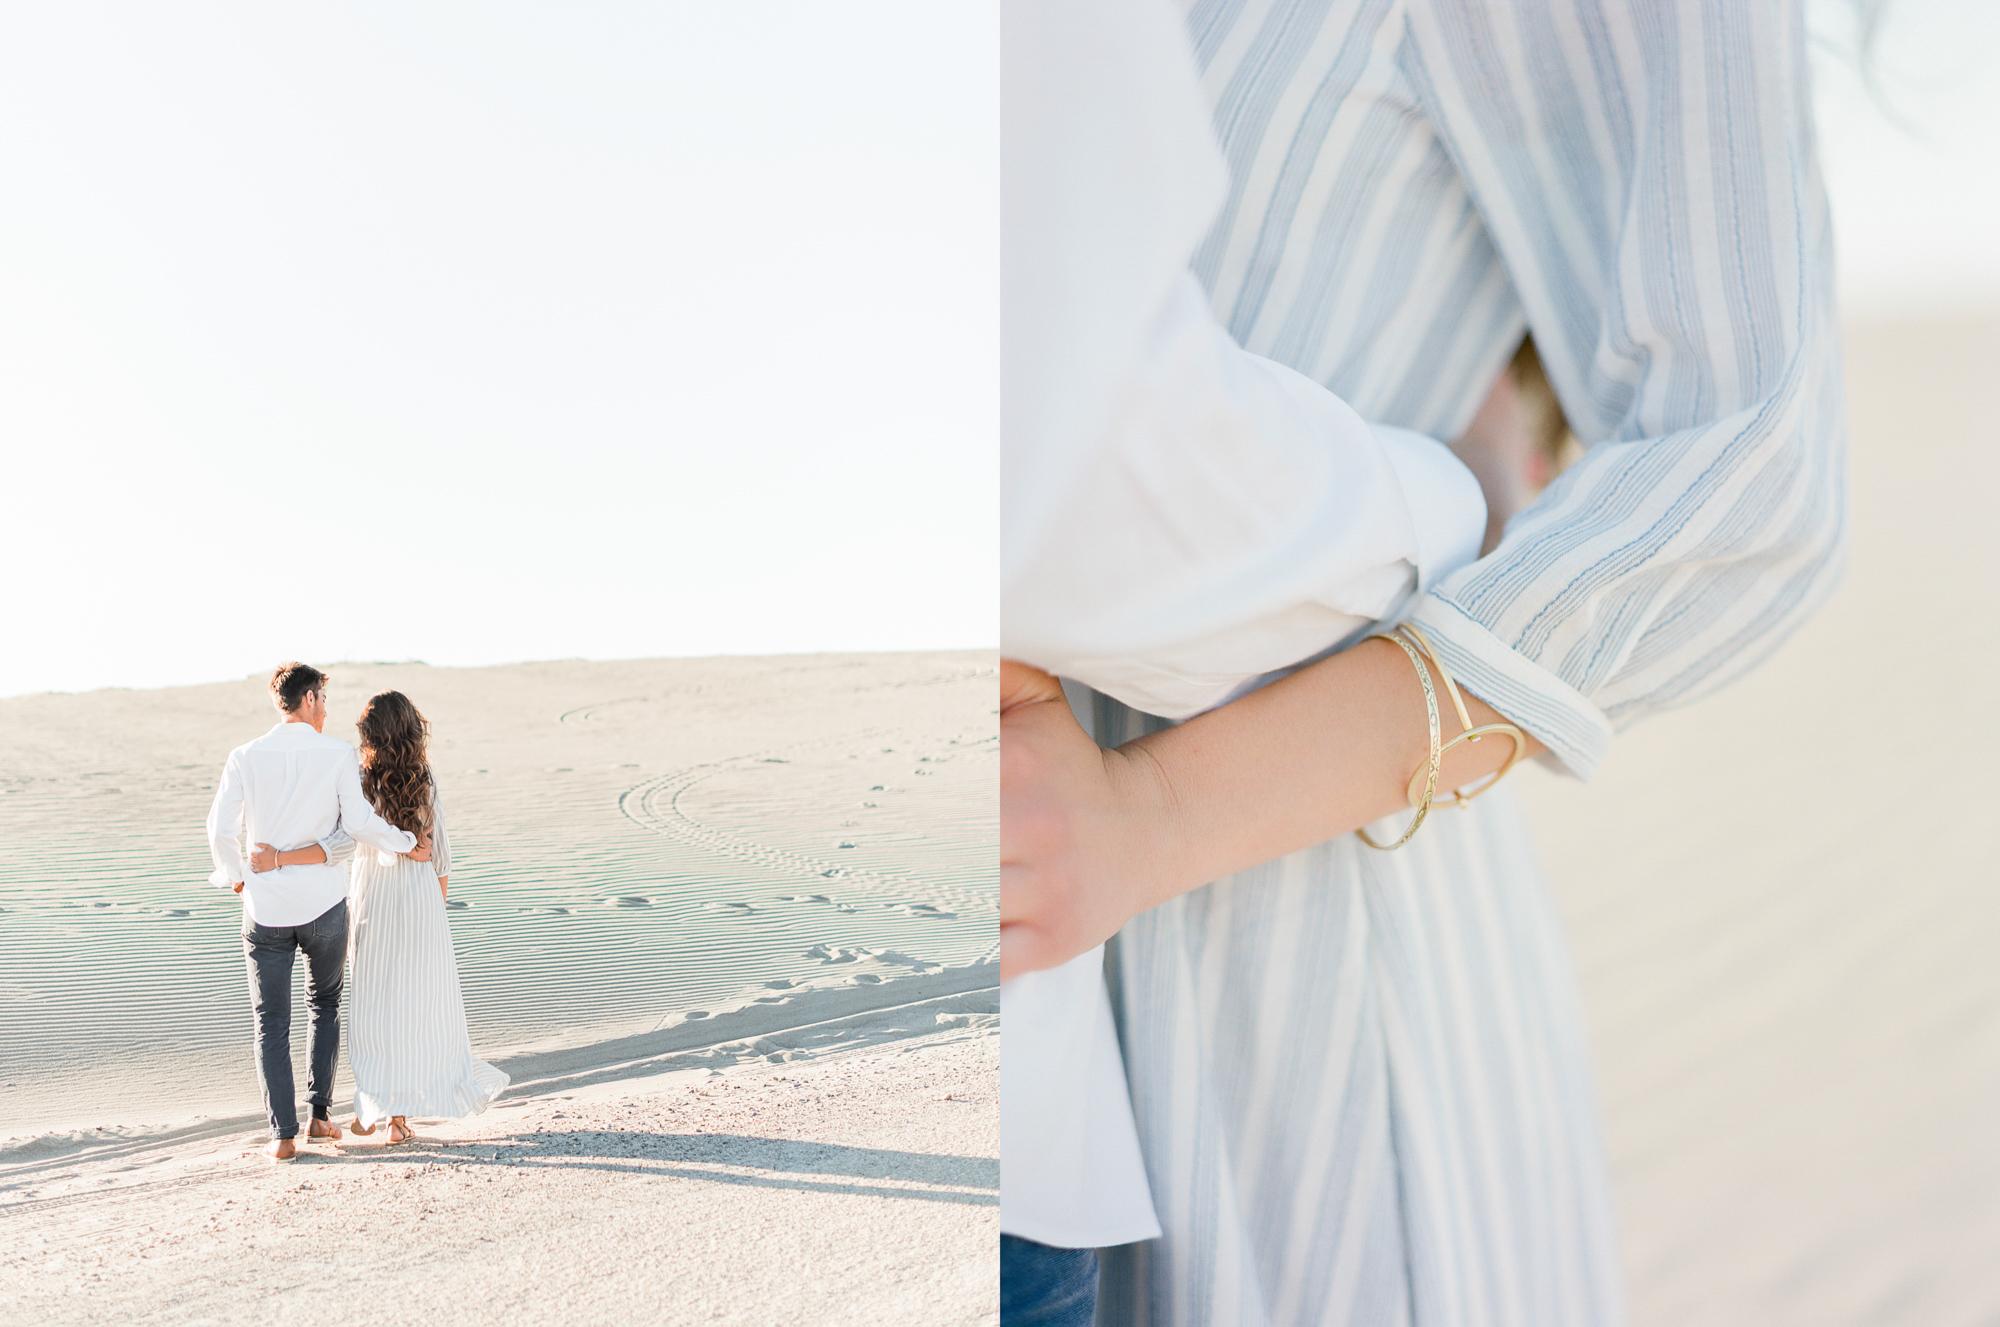 charlotte-charleston-wedding-family-film-destination-photographer-bruneau-sand-dunes-boise-idaho-10.jpg